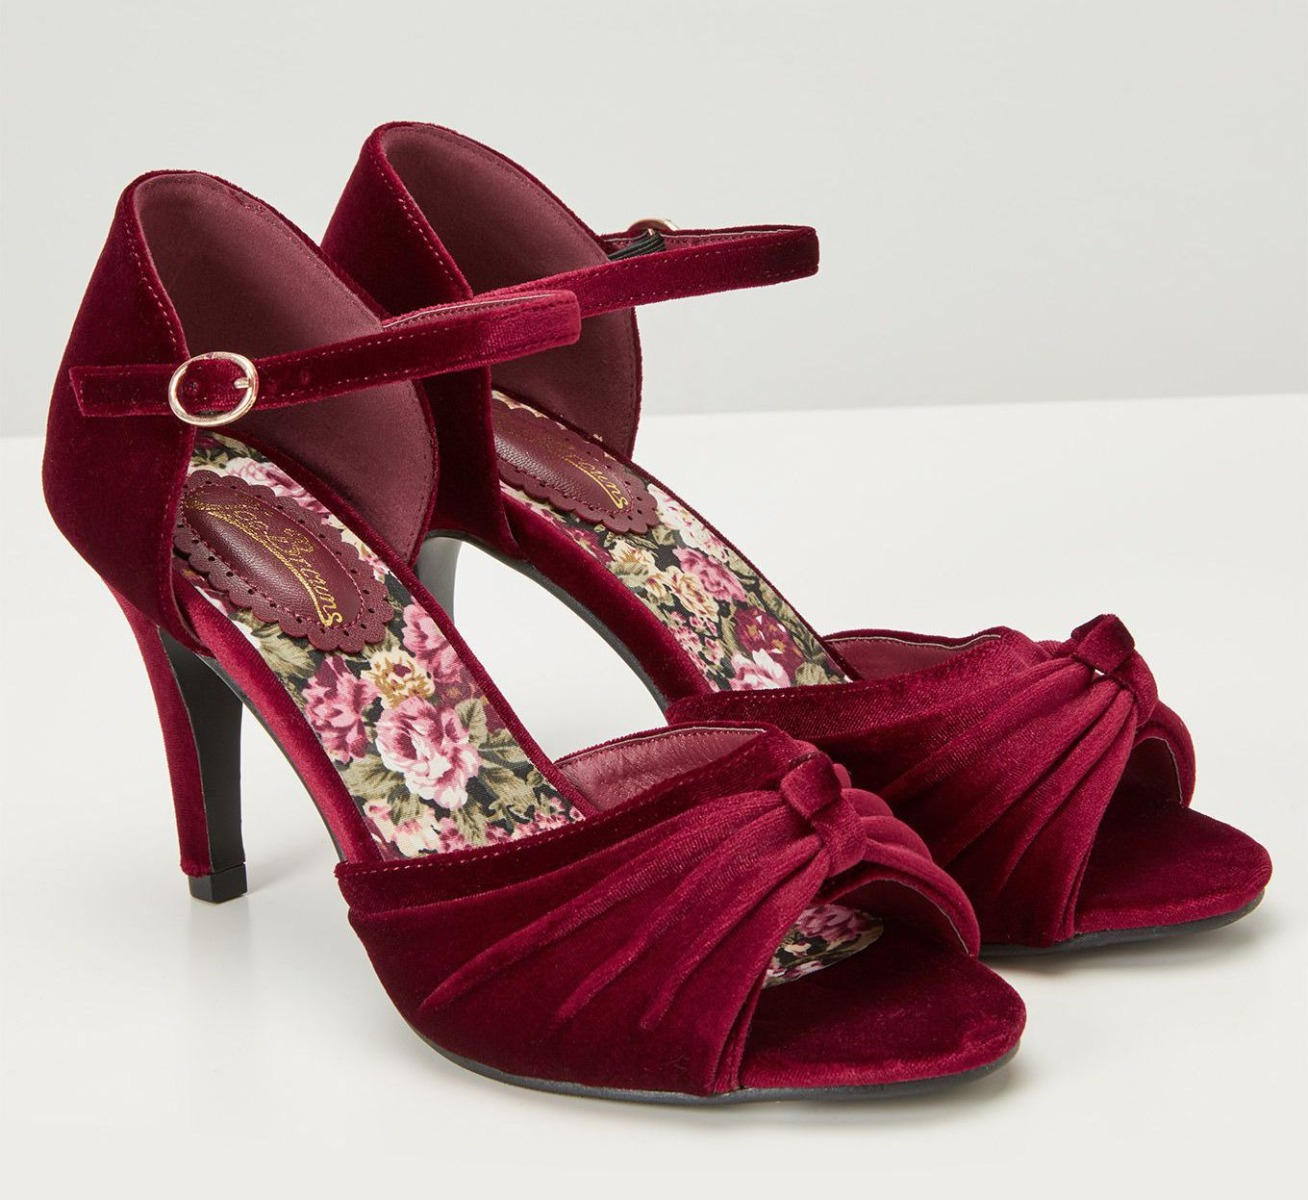 jbkc047_chaussures-escarpins-vintage-pin-up-50-s-glam-chic-fabulous-feminine-velvet